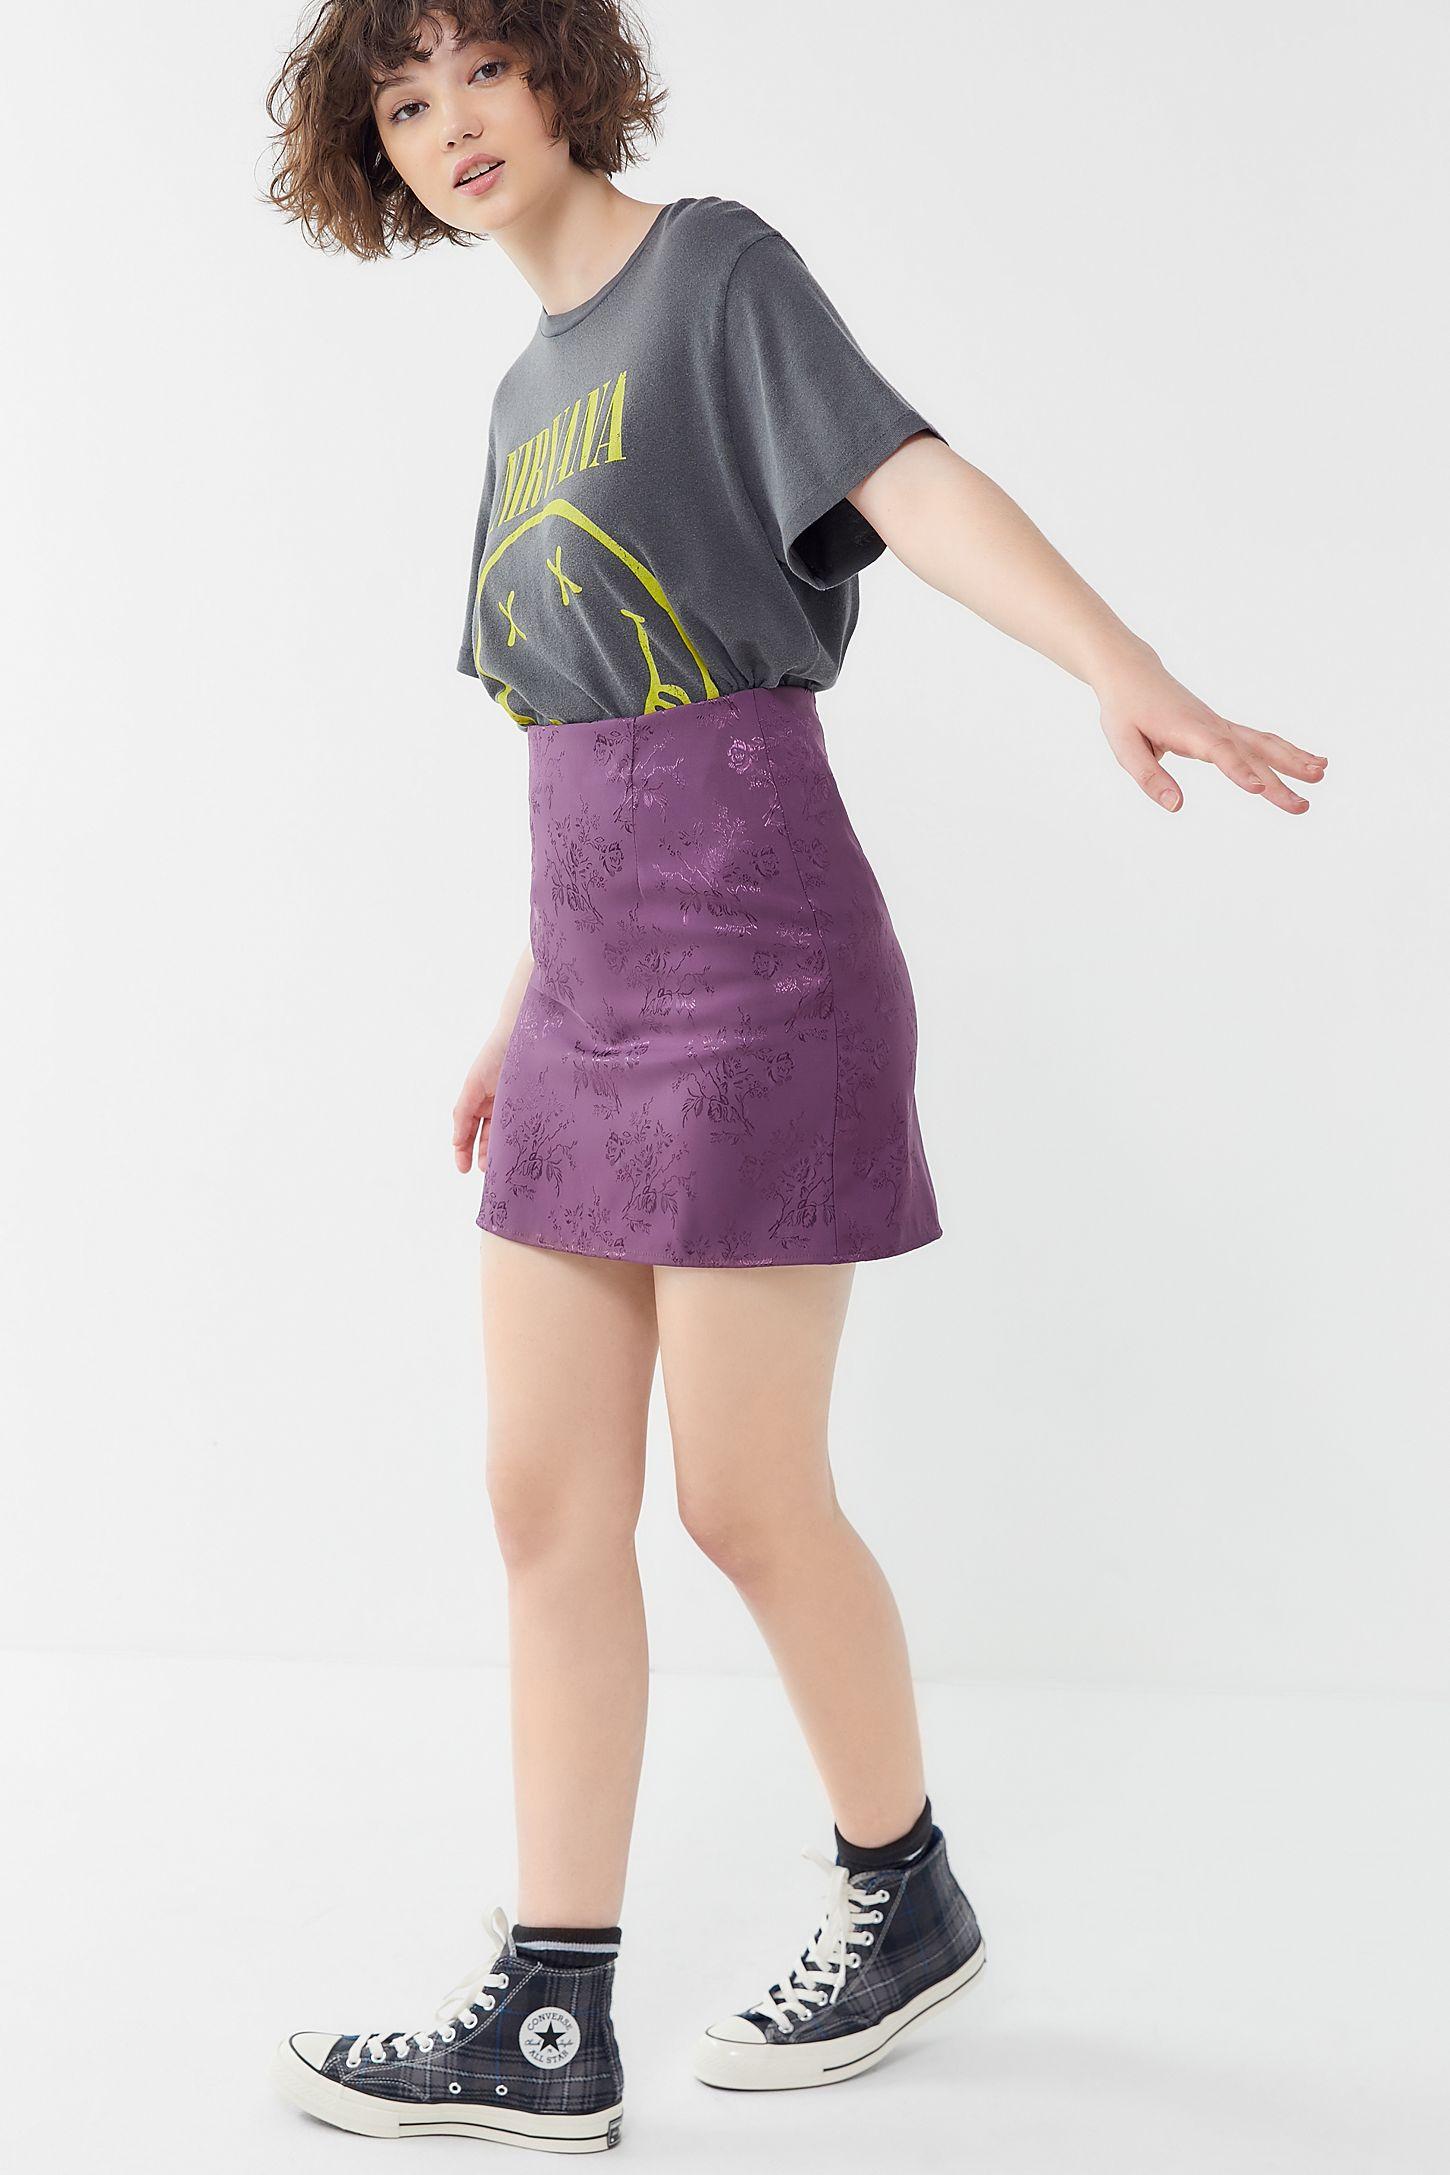 cea084e653687 Slide View  4  Urban Renewal Remnants Jacquard Mini Skirt